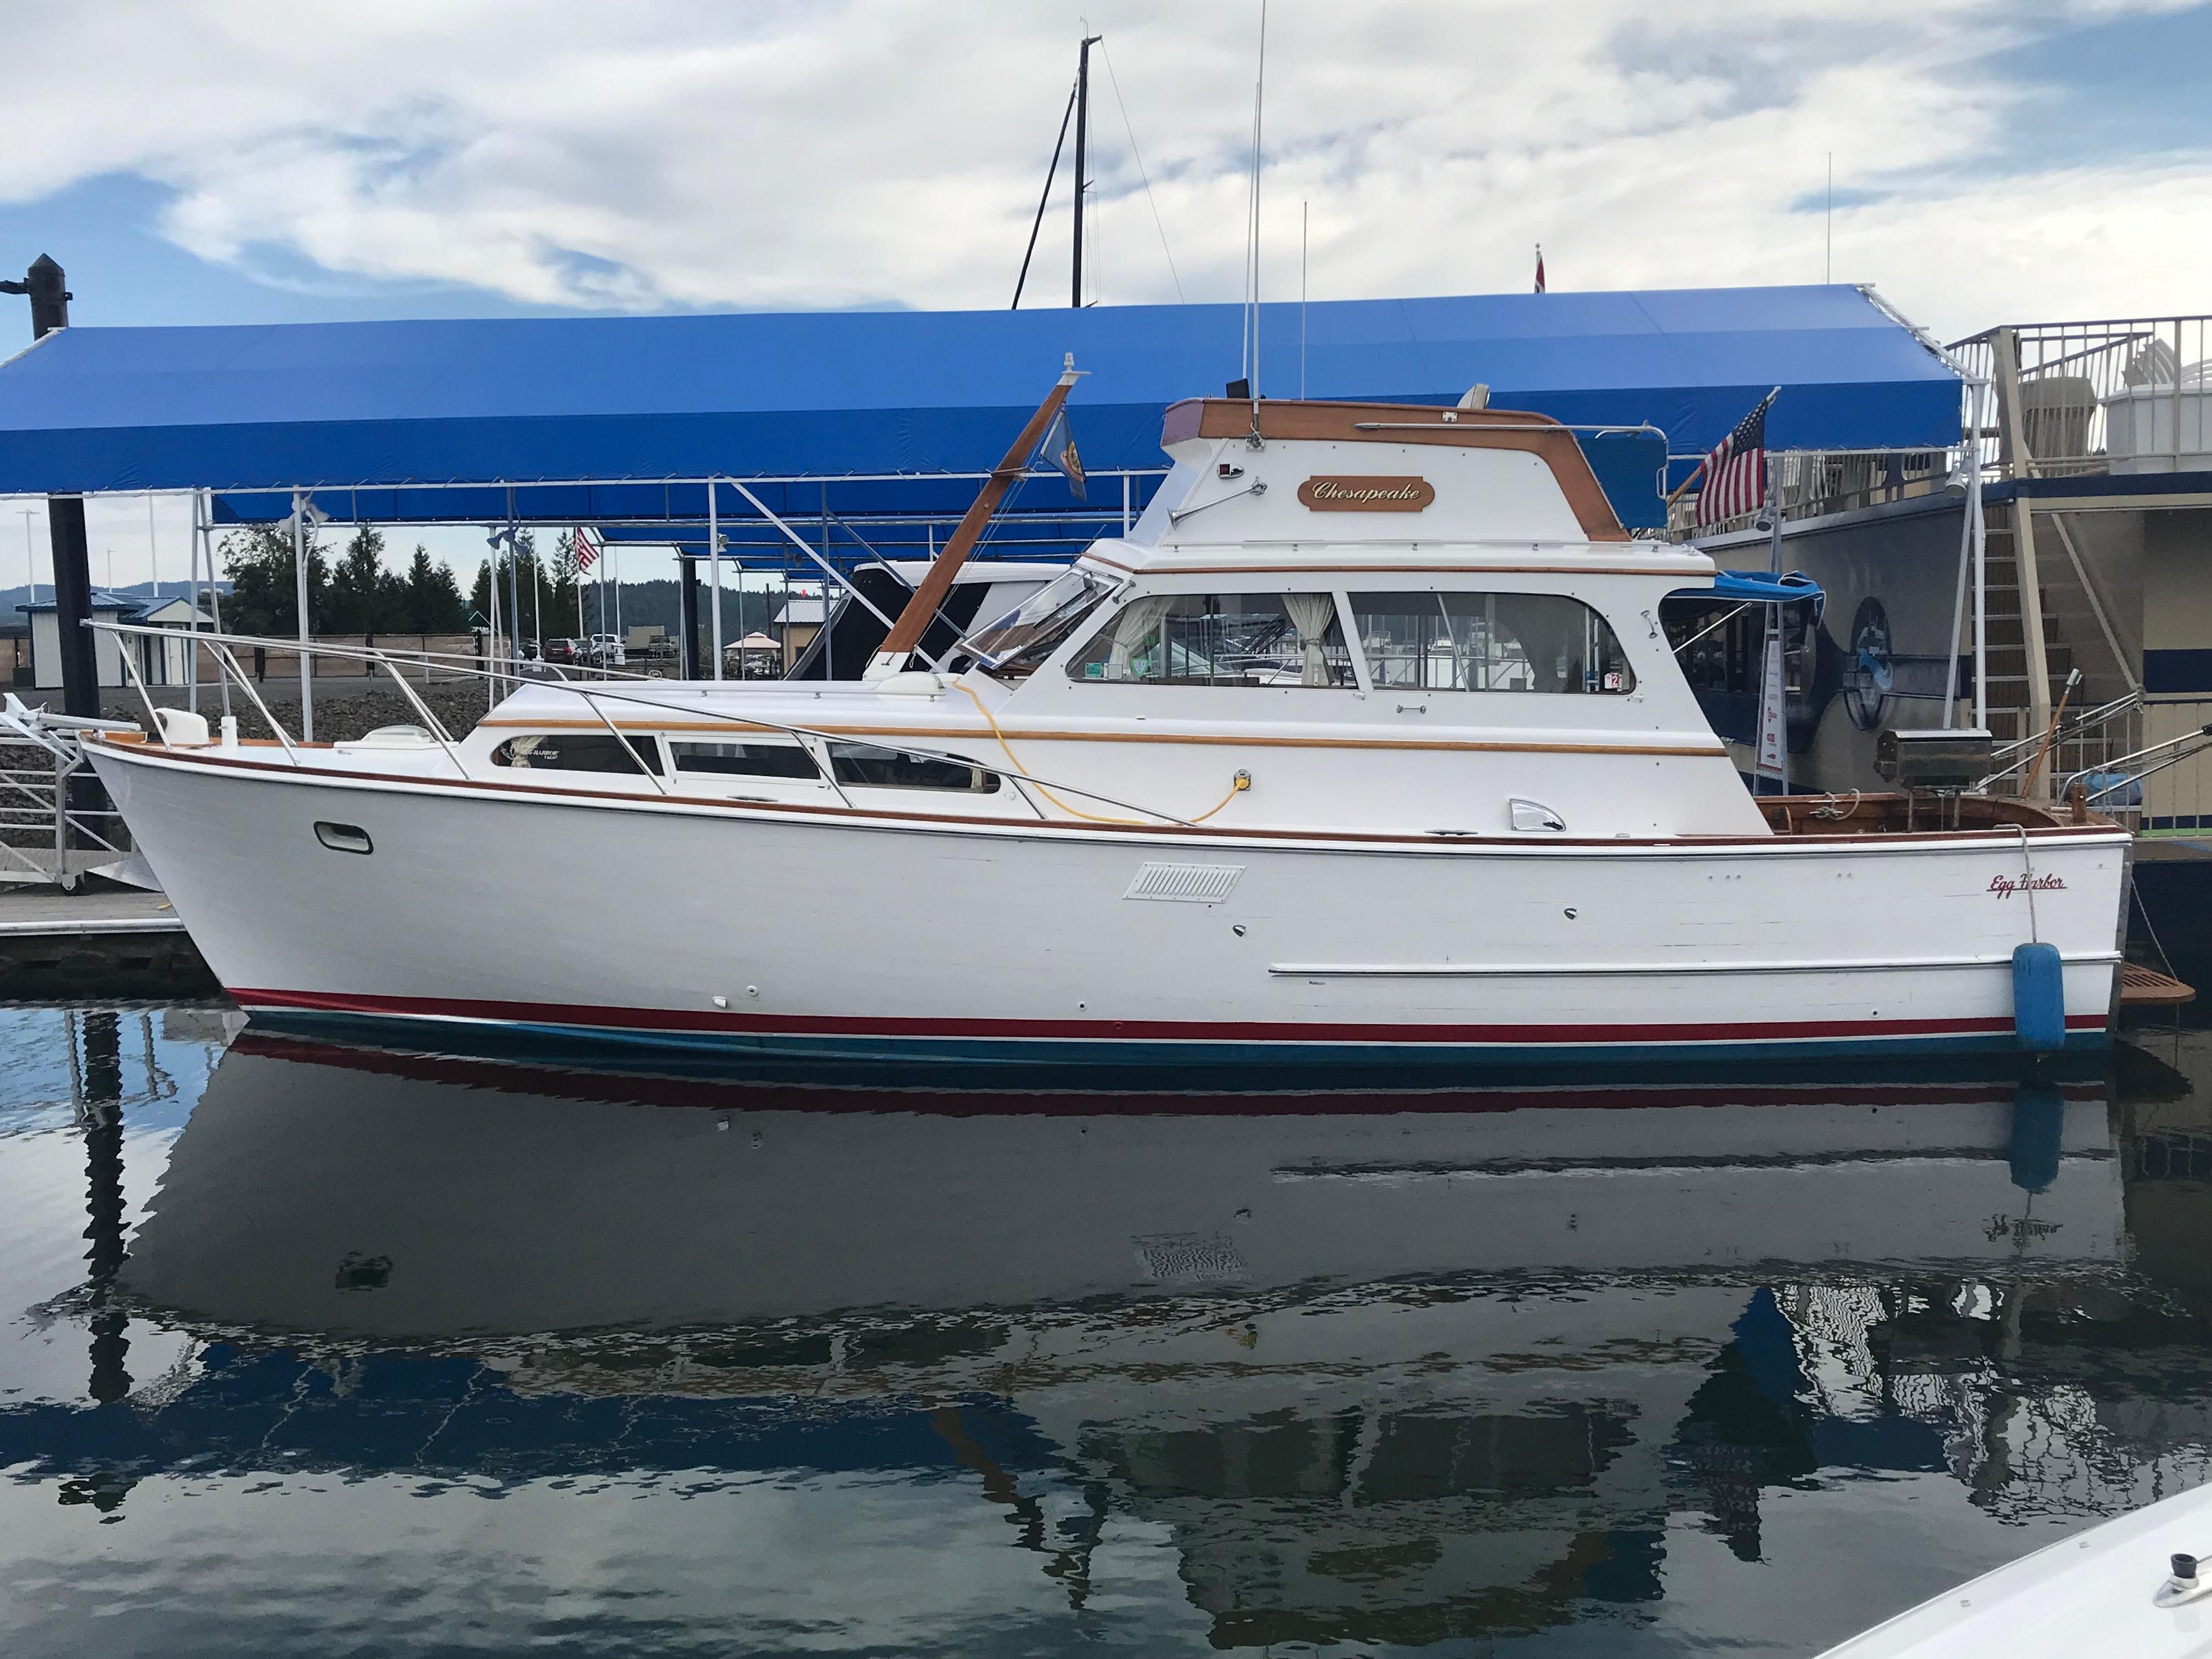 1967 Egg Harbor 37 Vintage Motor Yacht